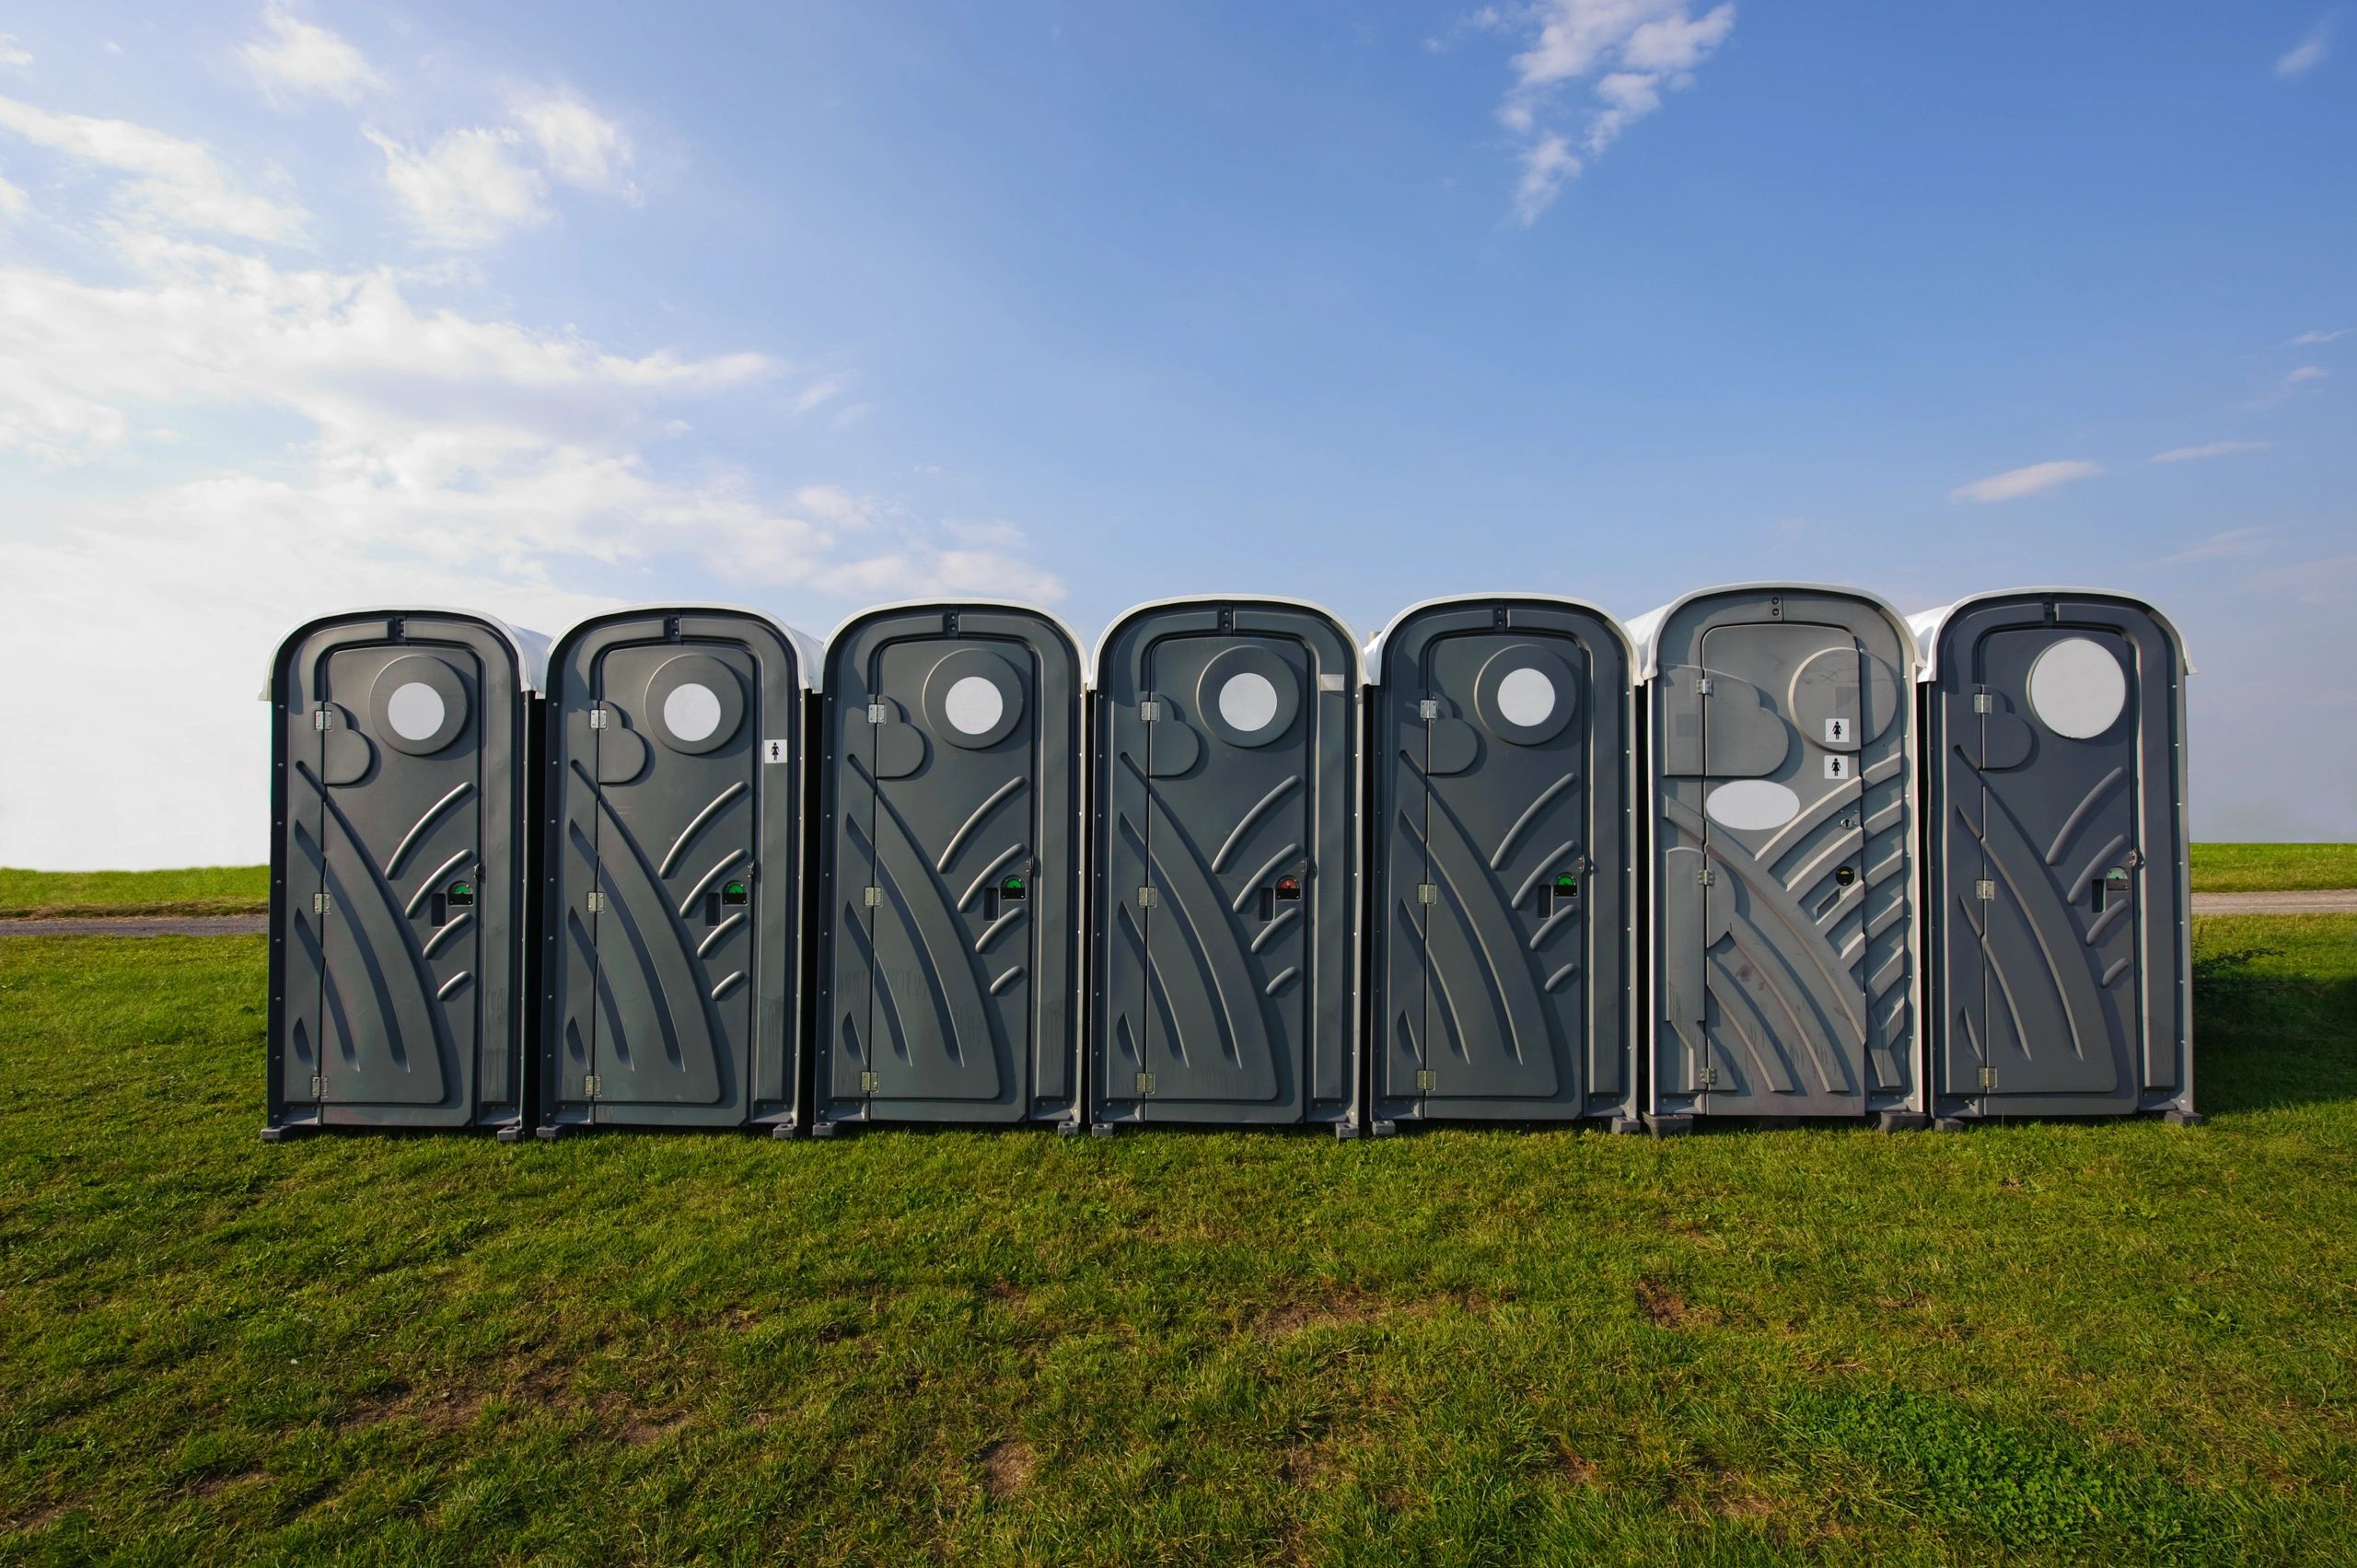 Baton Rouge Porta Potty   Portable Toilet Rentals, Porta Potty